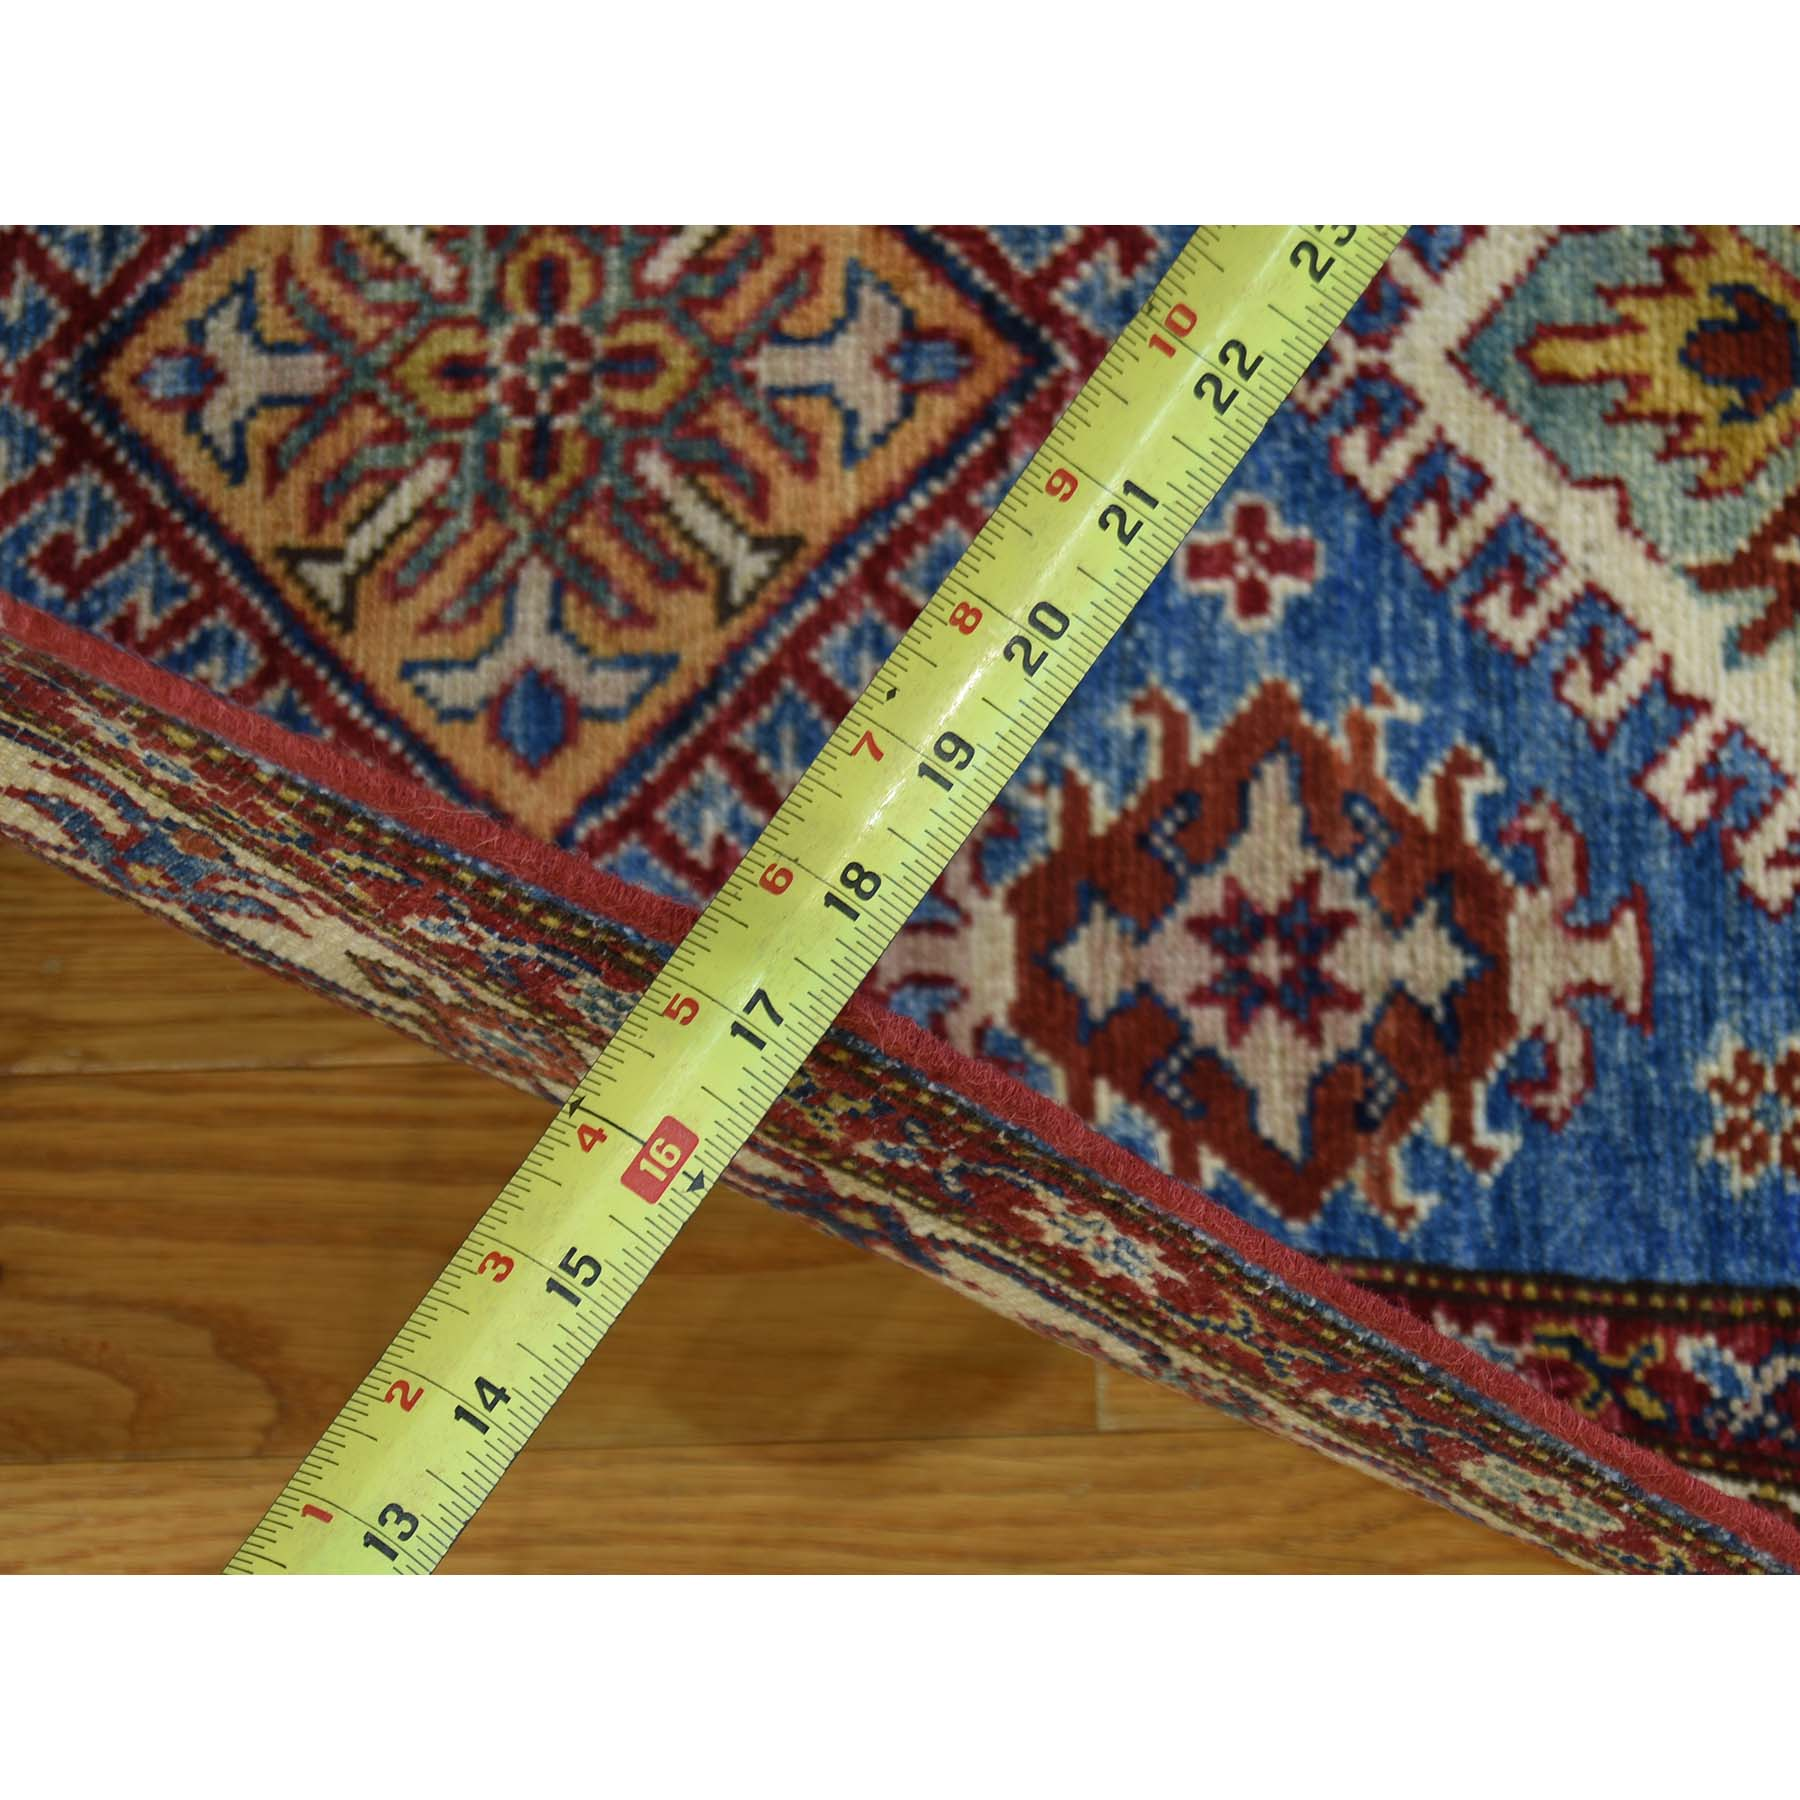 2-9--x4-2-- Hand Knotted Pure Wool Sky Blue Super Kazak Oriental Rug